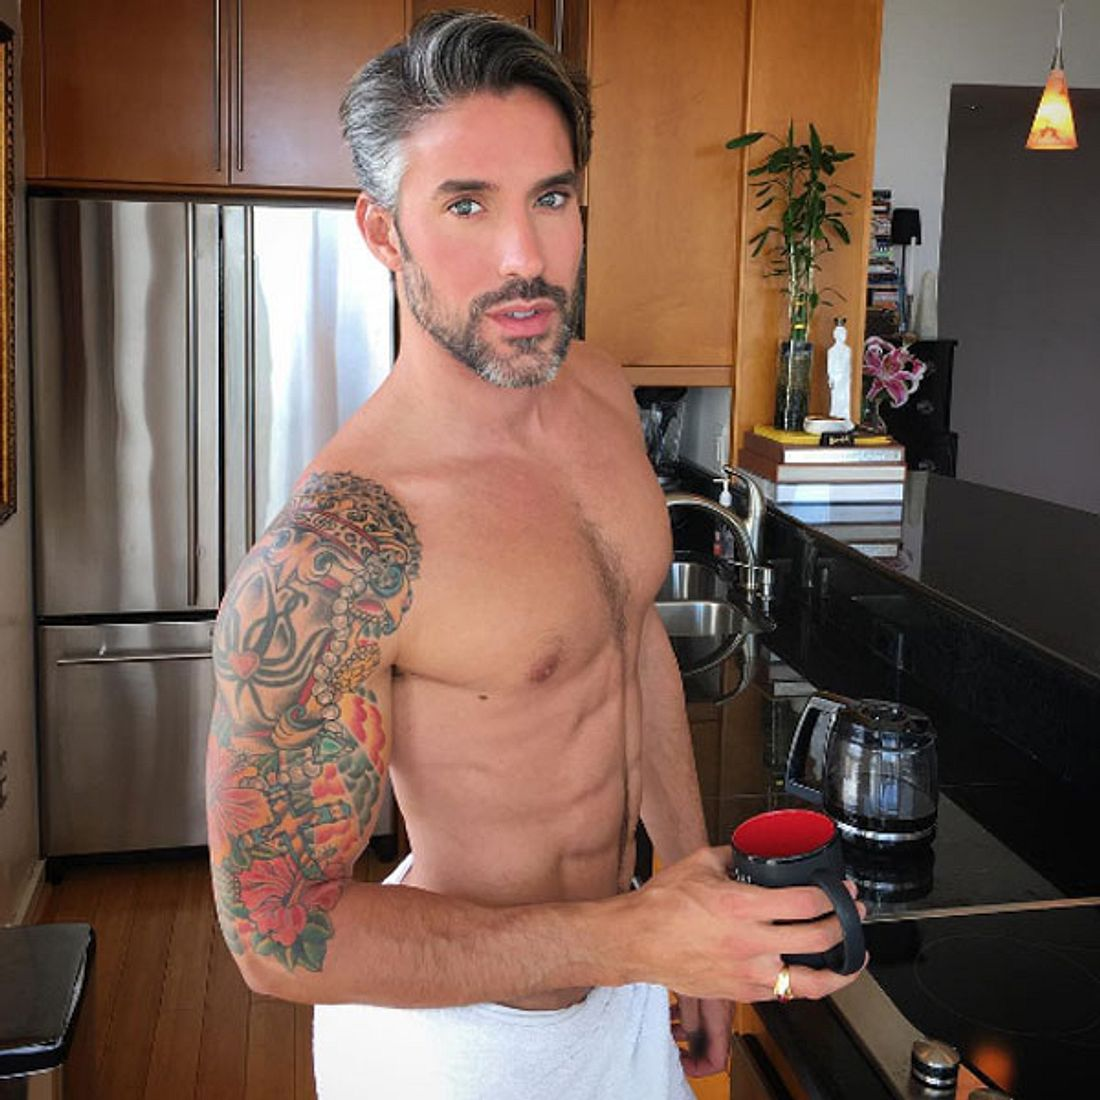 Schwuler Bachelor Robert Sepúlveda